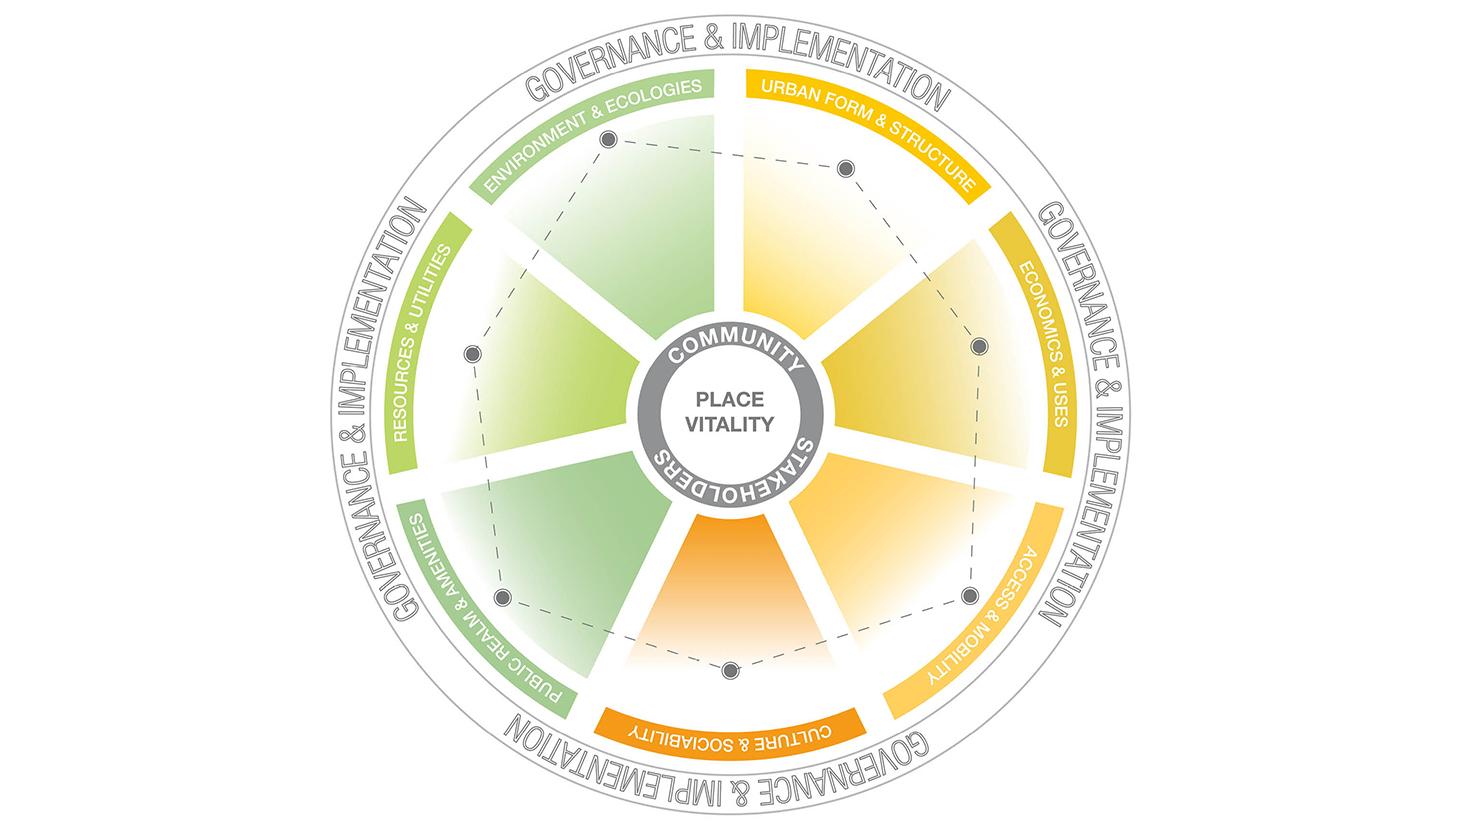 rsz-01-place-vitality-criteria